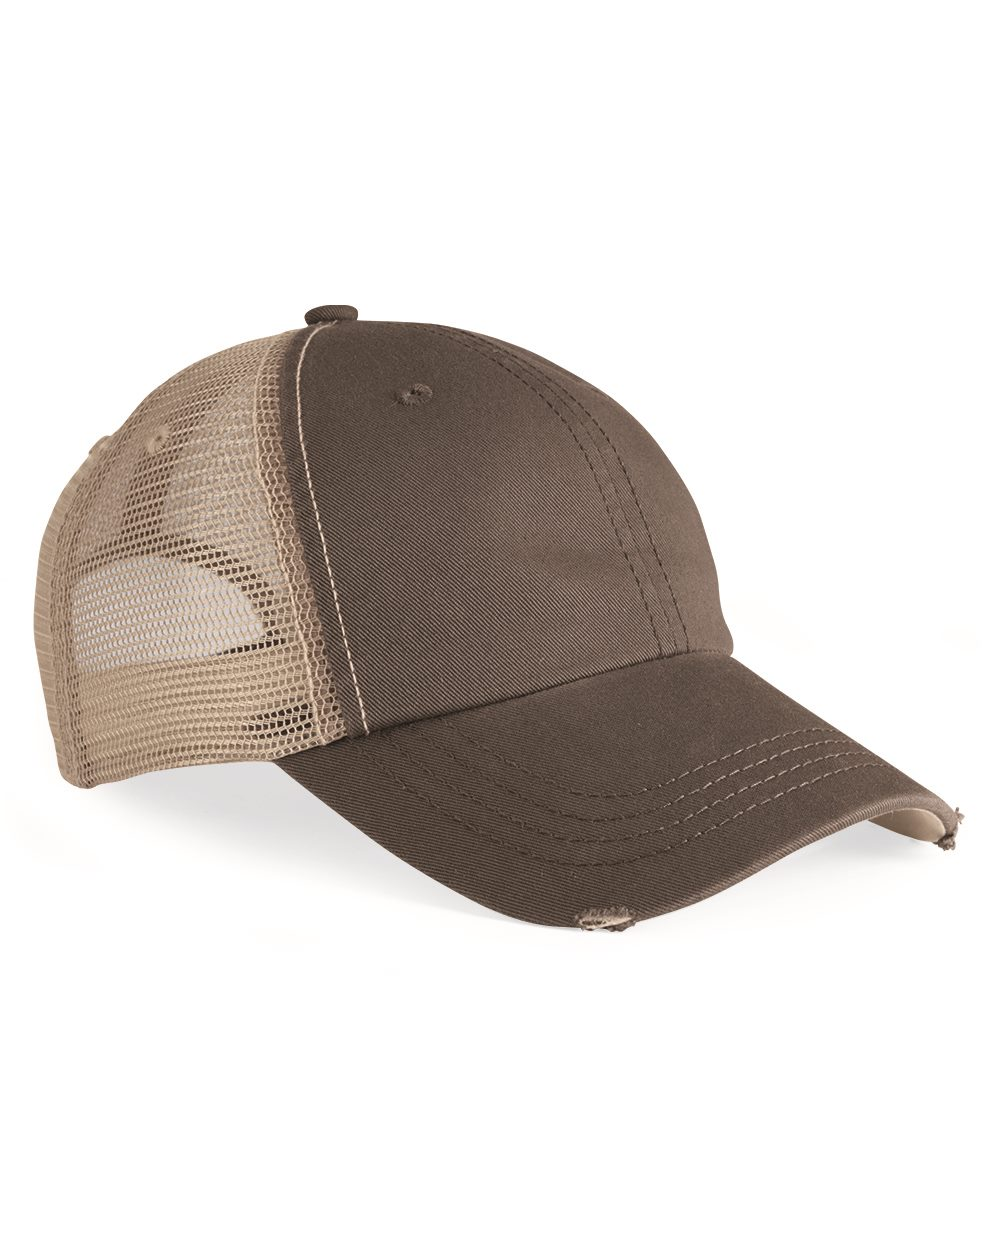 Mega Cap-Organic Cotton/Mesh Cap